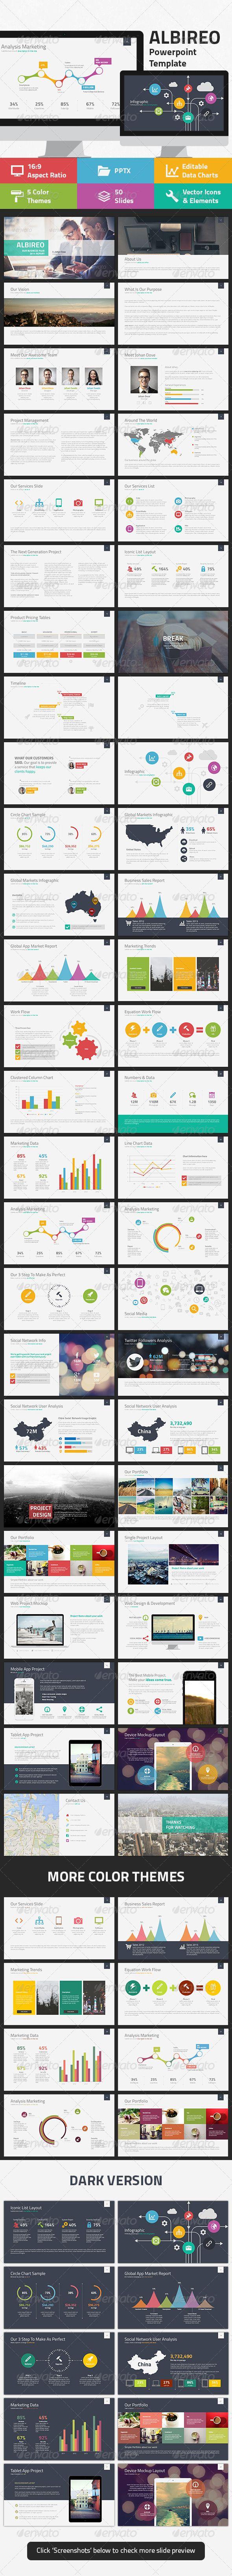 Albireo Powerpoint Template - Business Powerpoint Templates